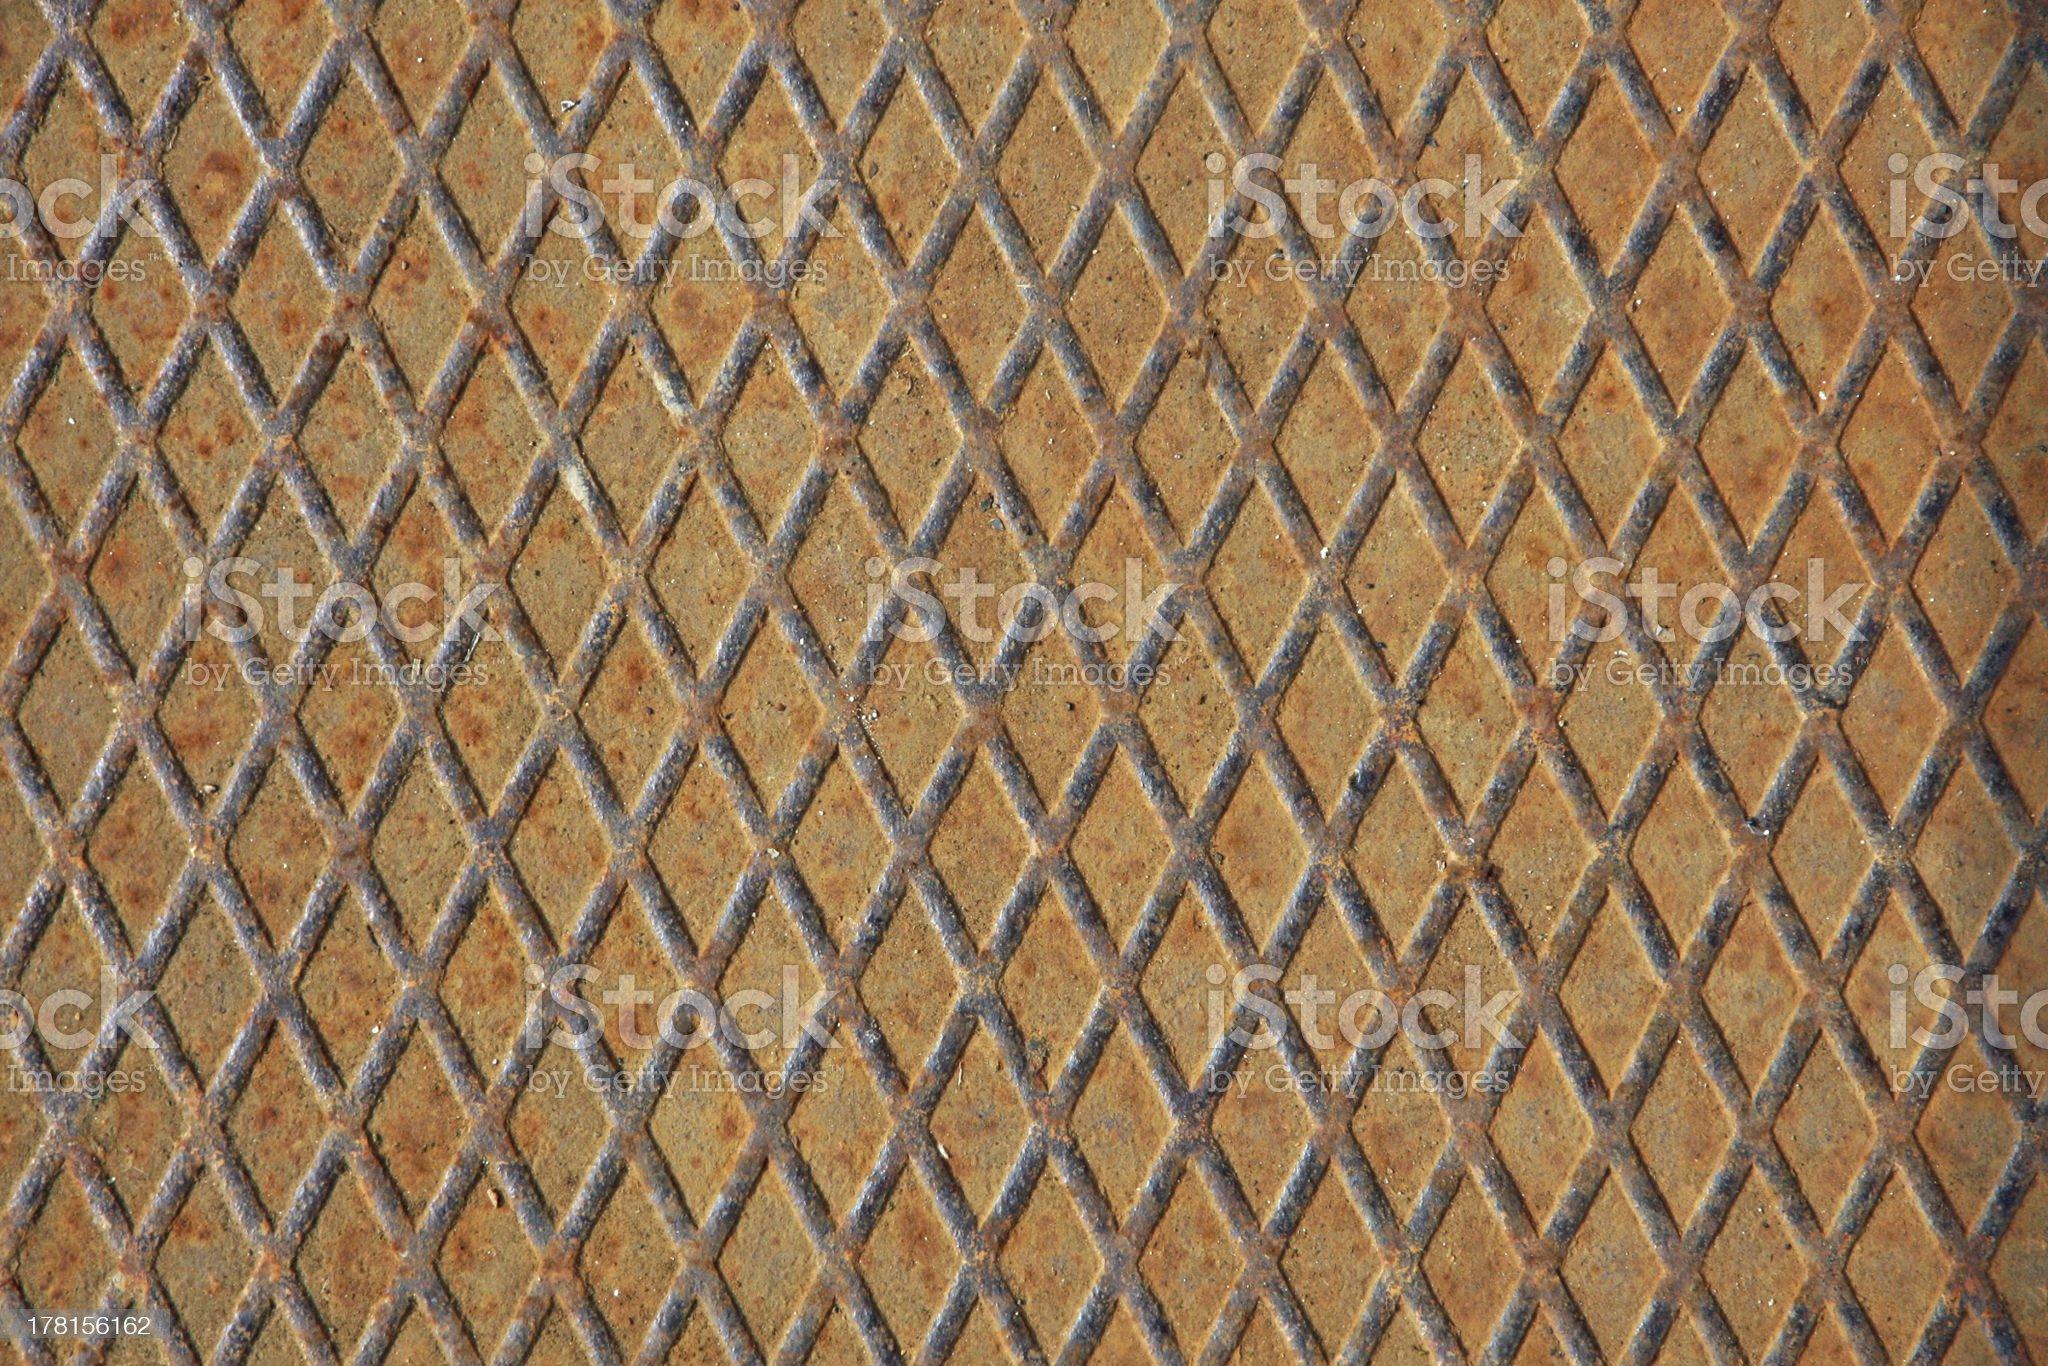 heavy diamonds grid iron used as industrial rust floor royalty-free stock photo